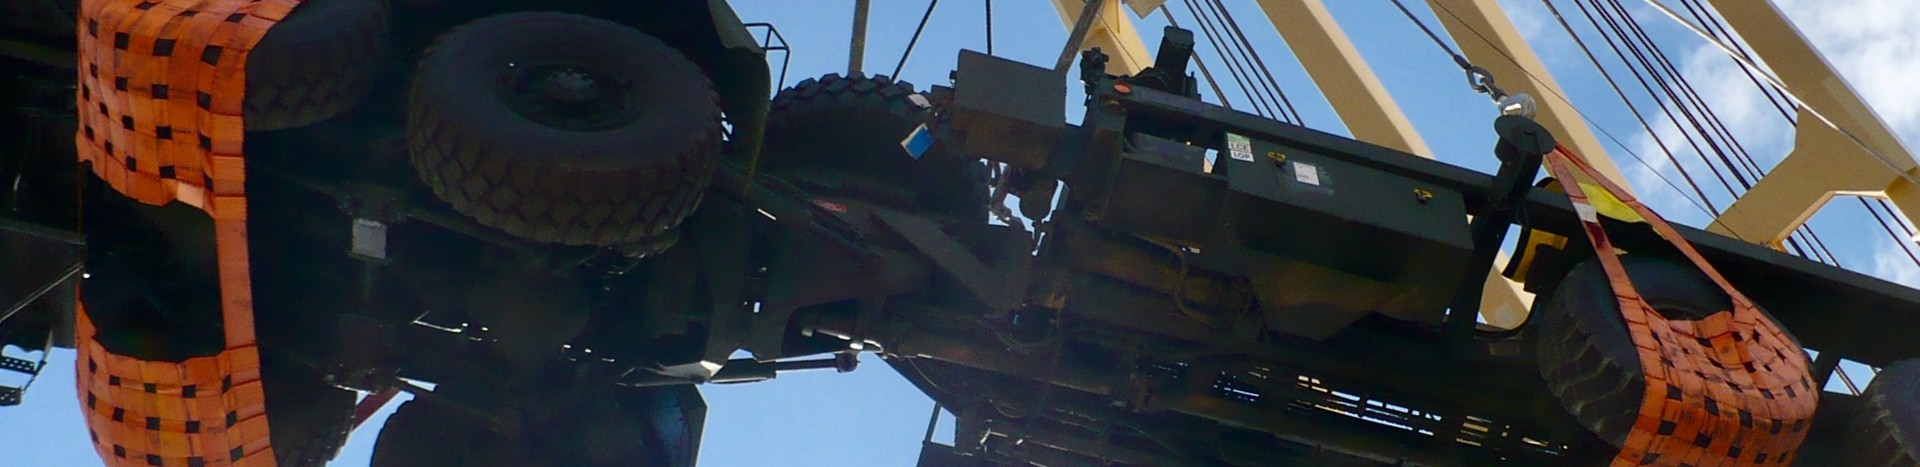 Lifting wheelnet